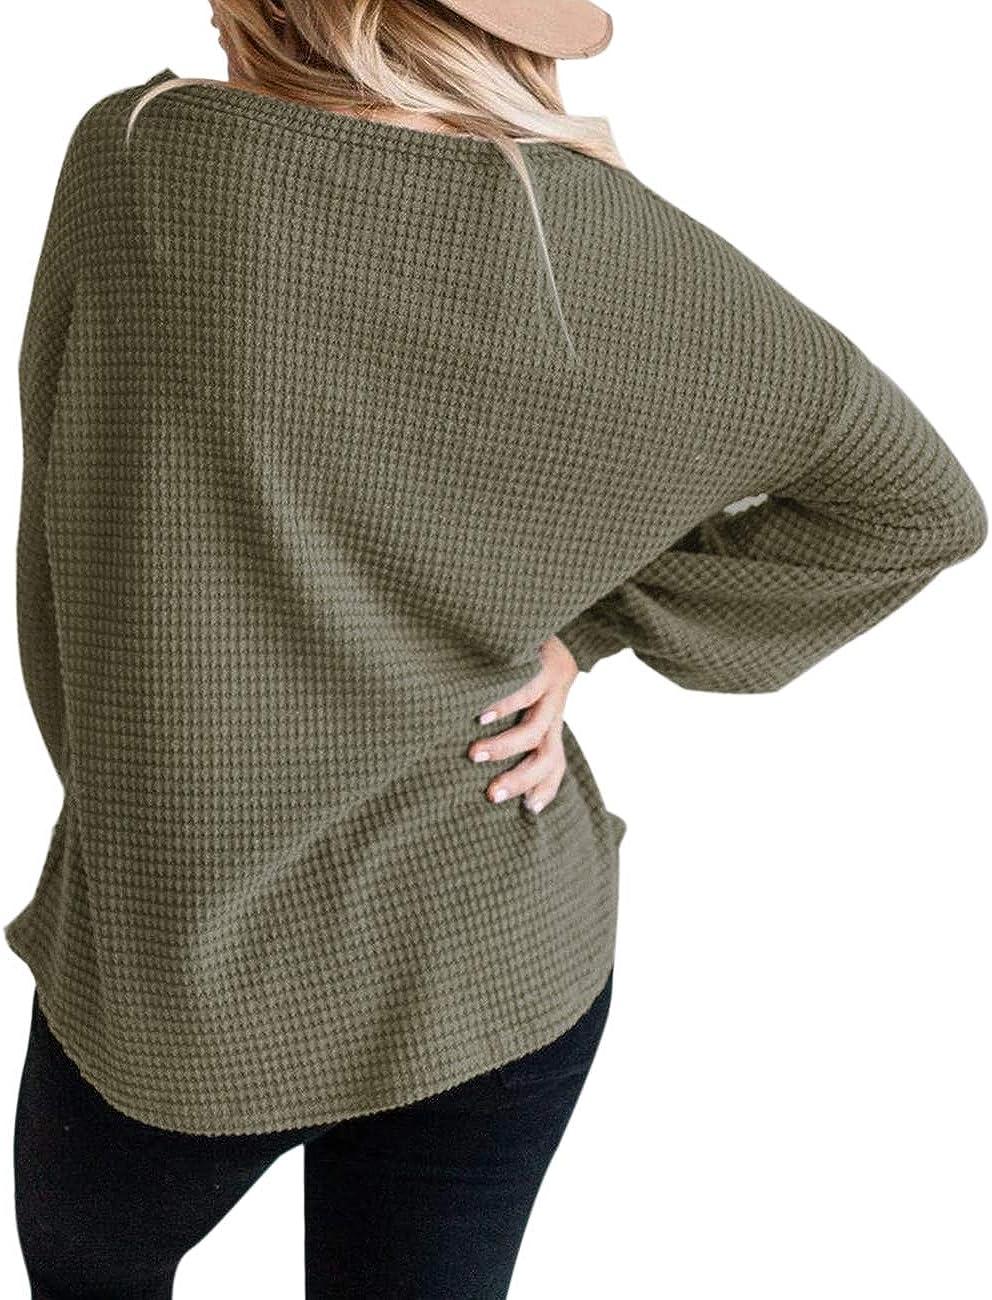 MEROKEETY Womens Long Balloon Sleeve Waffle Knit Tops Crew Neck Oversized Sweater Pullover